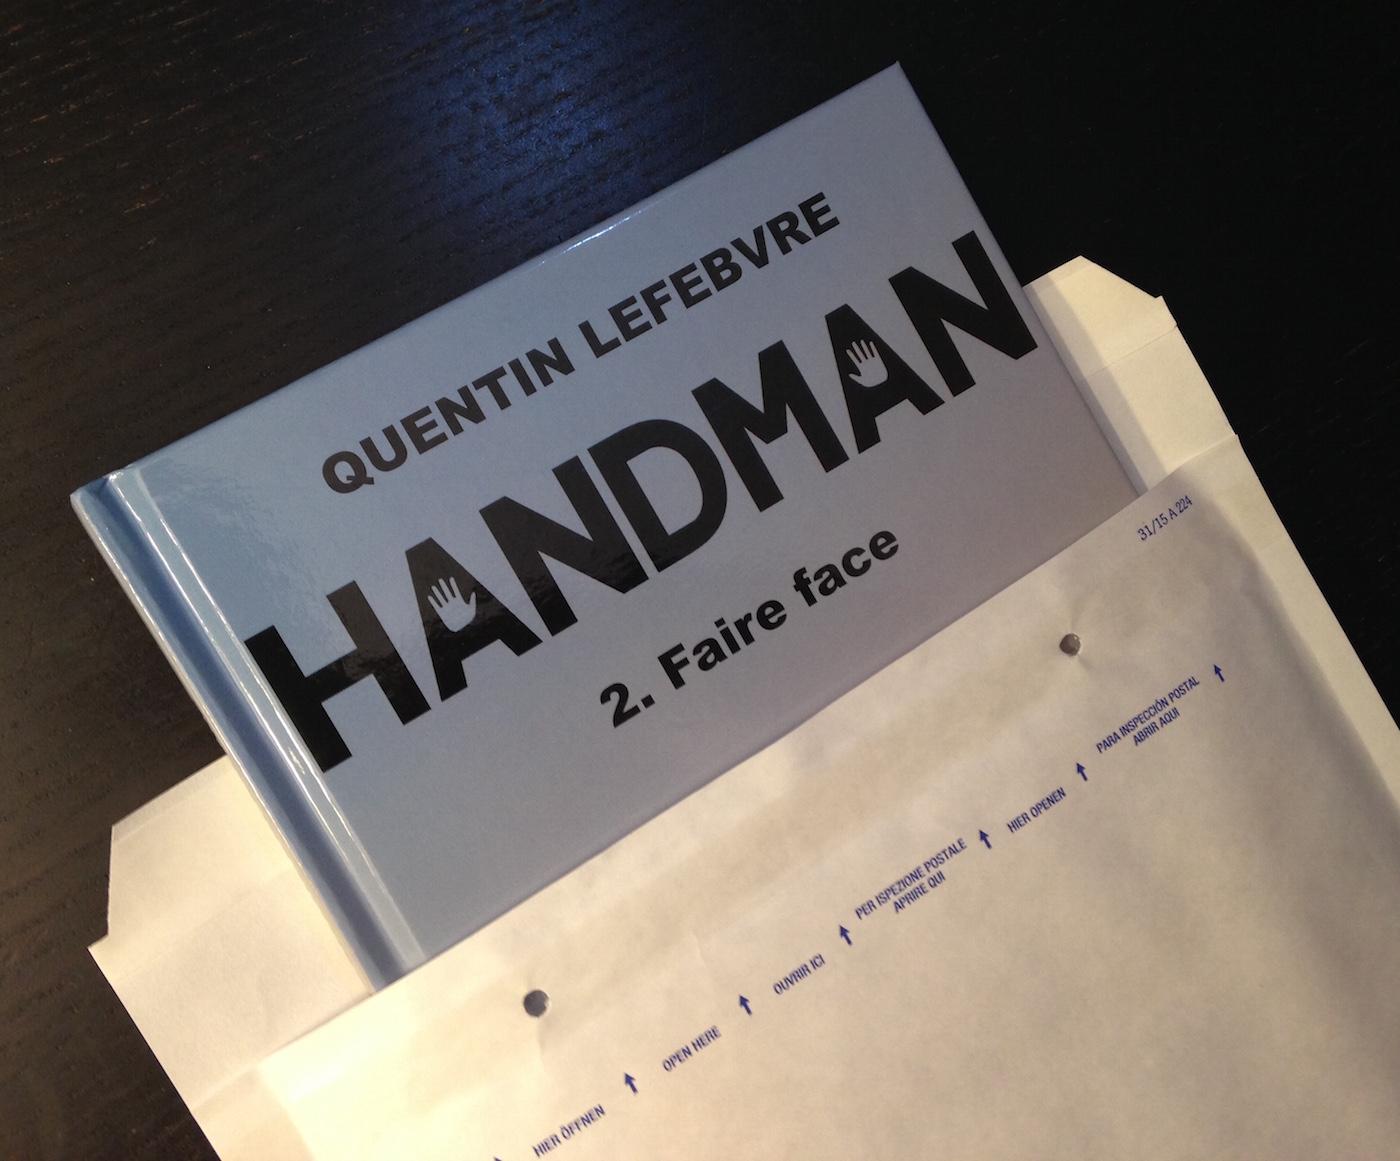 enveloppe envoi bd handman par quentin lefebvre